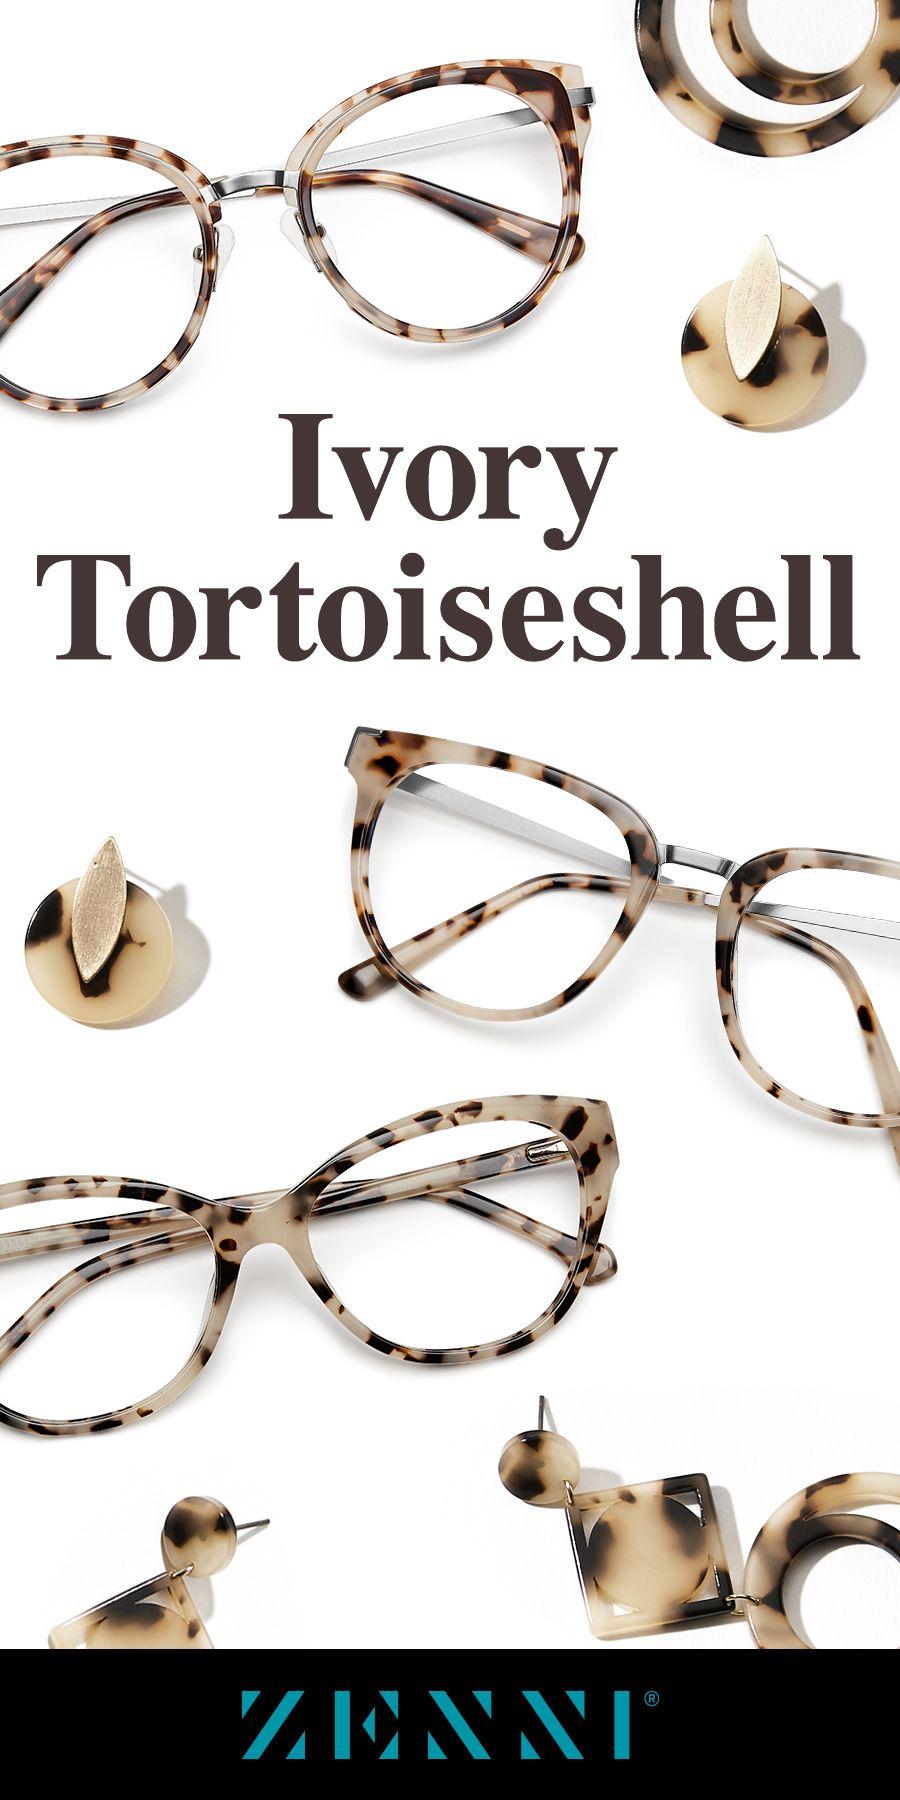 Ivory Tortoiseshell Frames